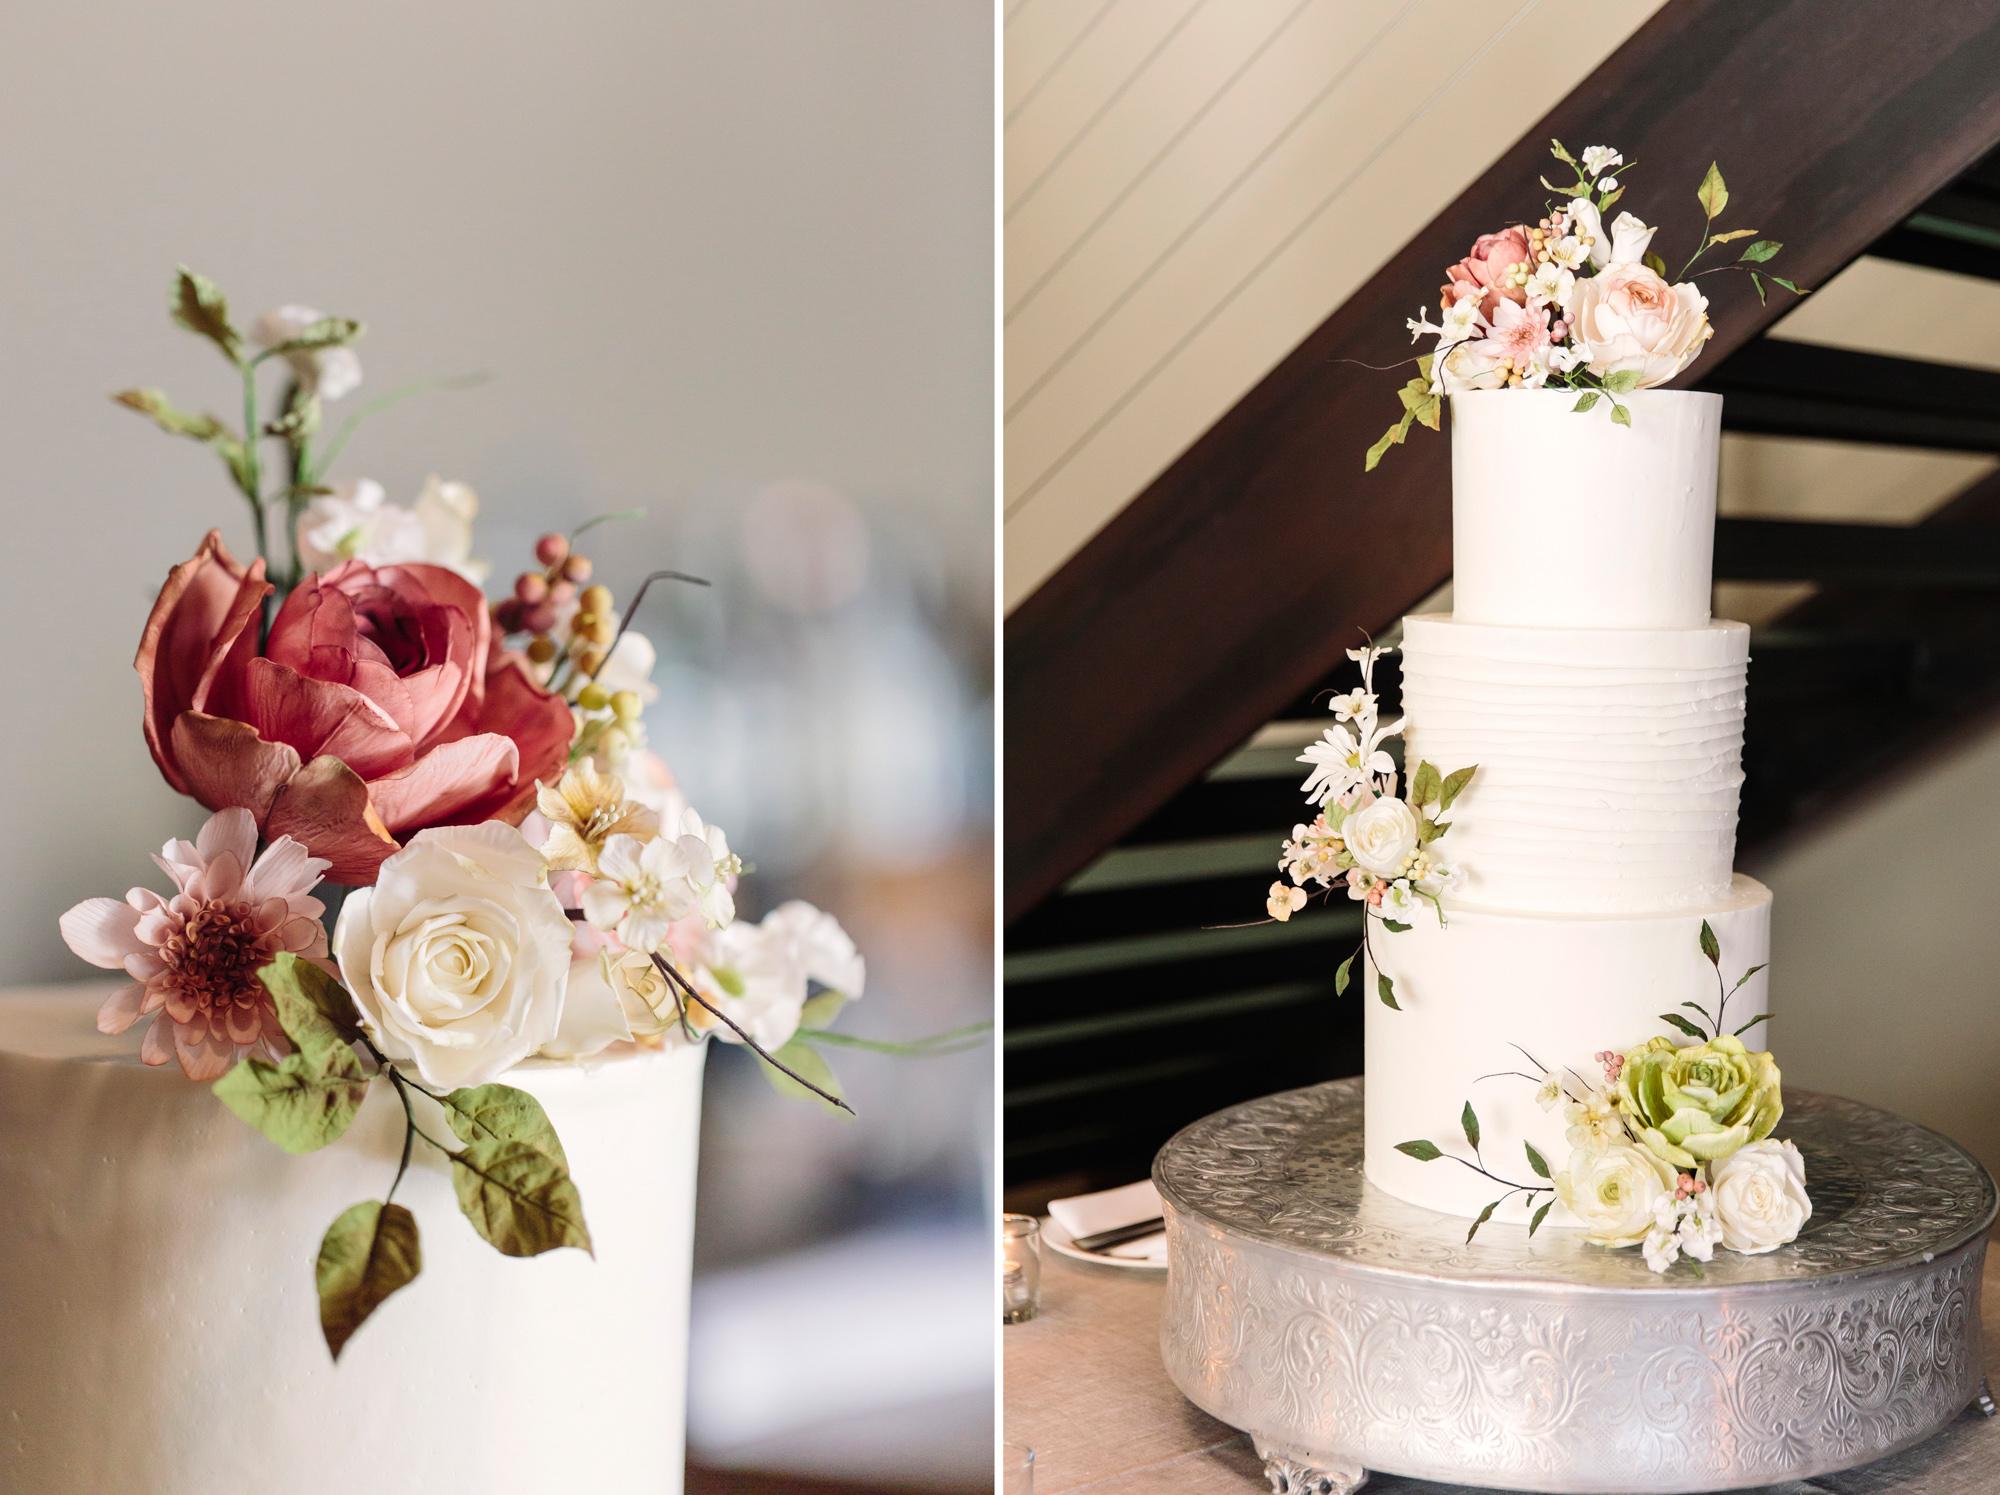 59_Rowan_Brian_The_Roundhouse_Wedding_Beacon_NY_Tanya_Salazar_Photography.jpg